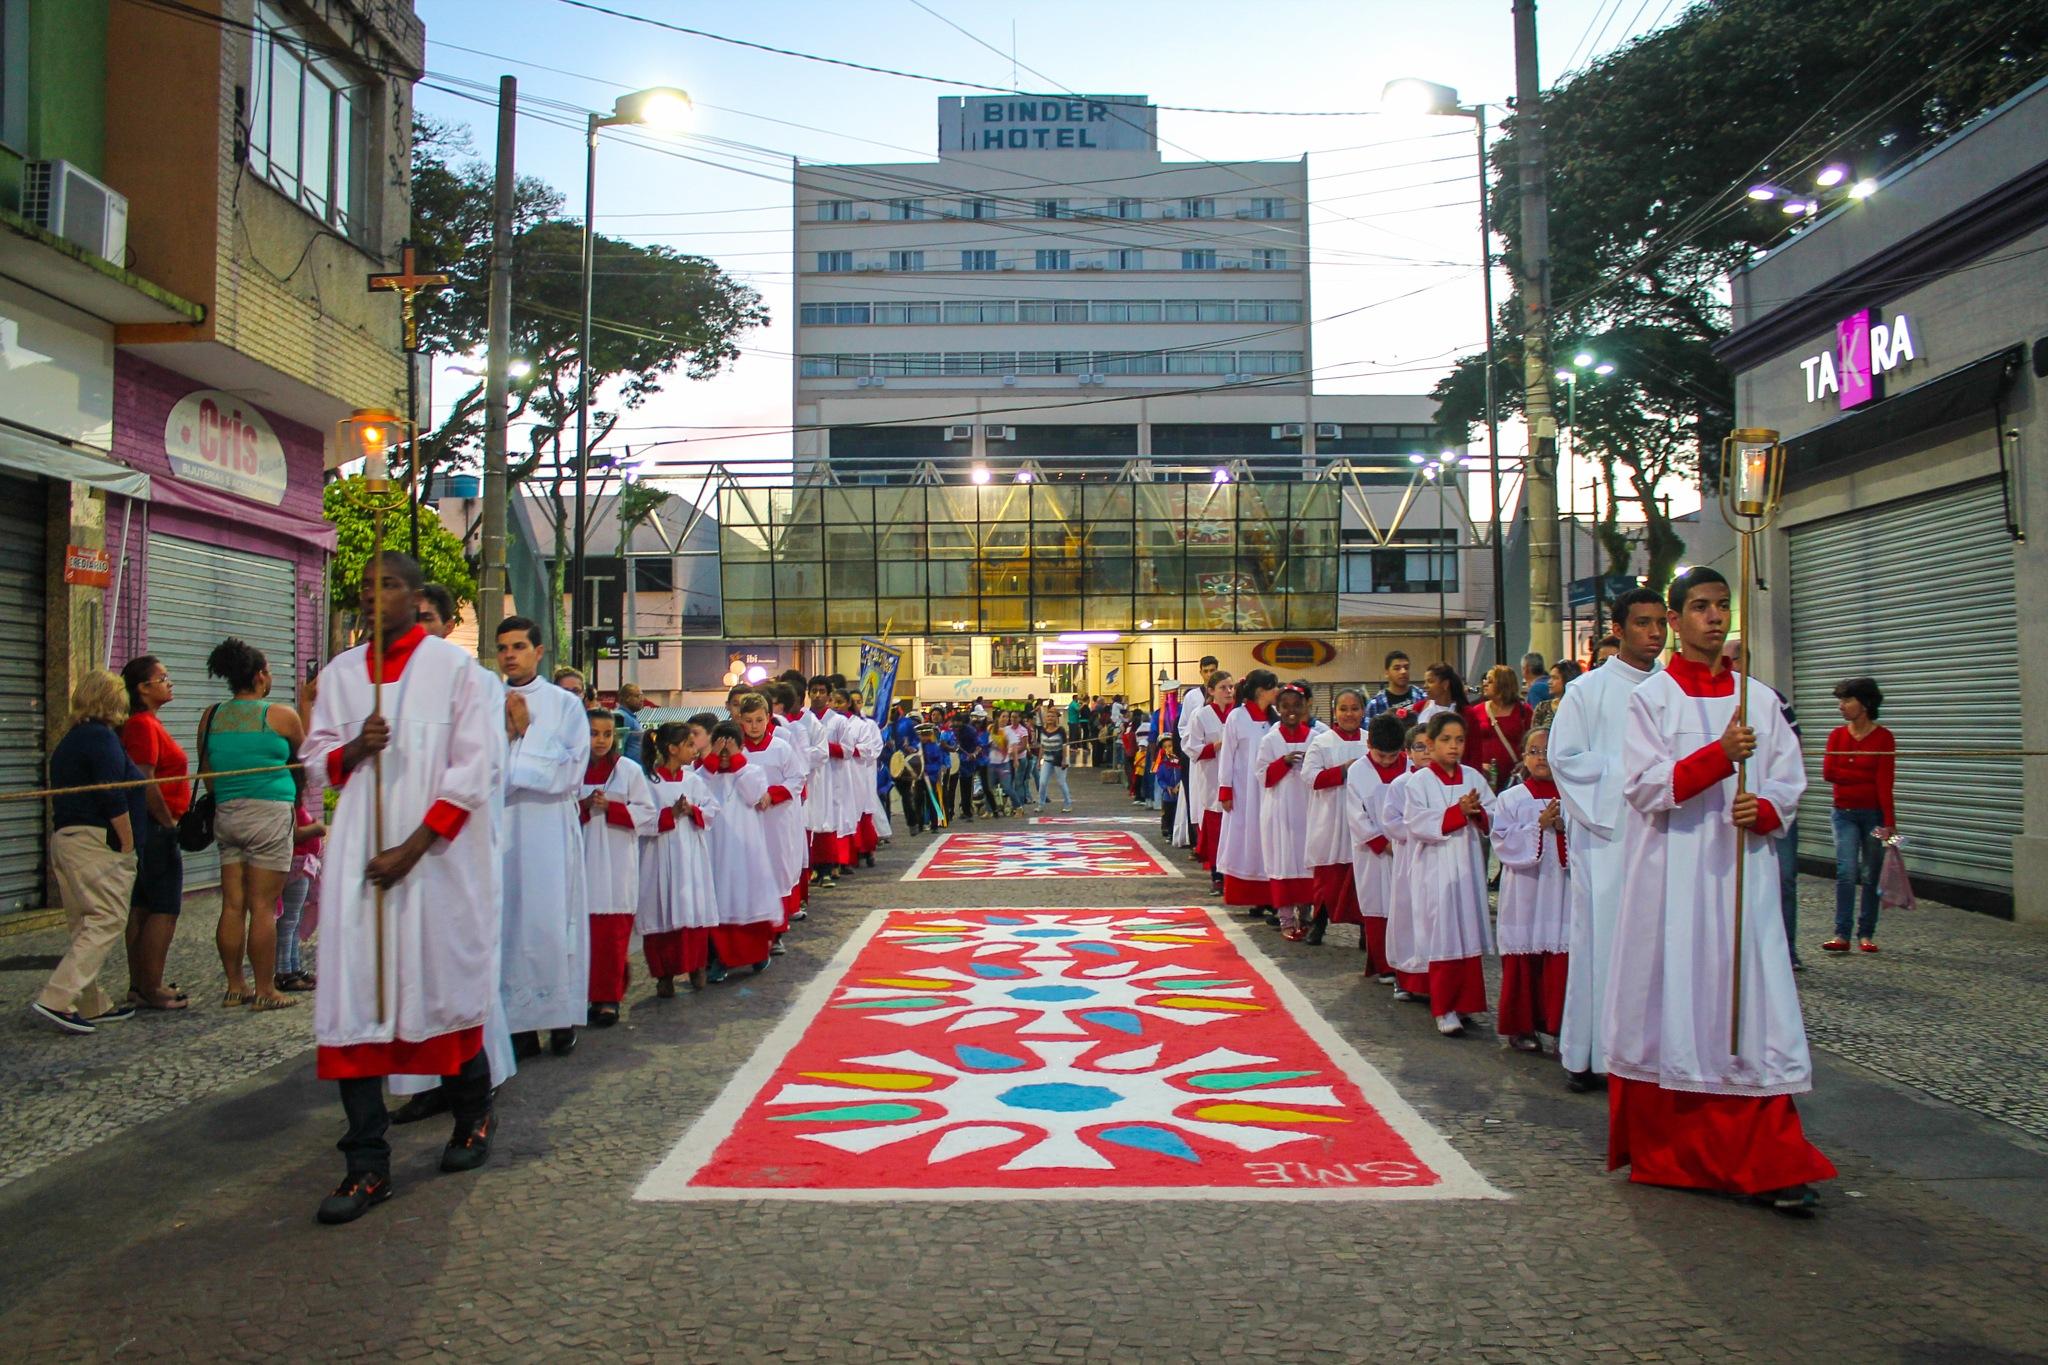 Festa do Divino by Robson Shimizu